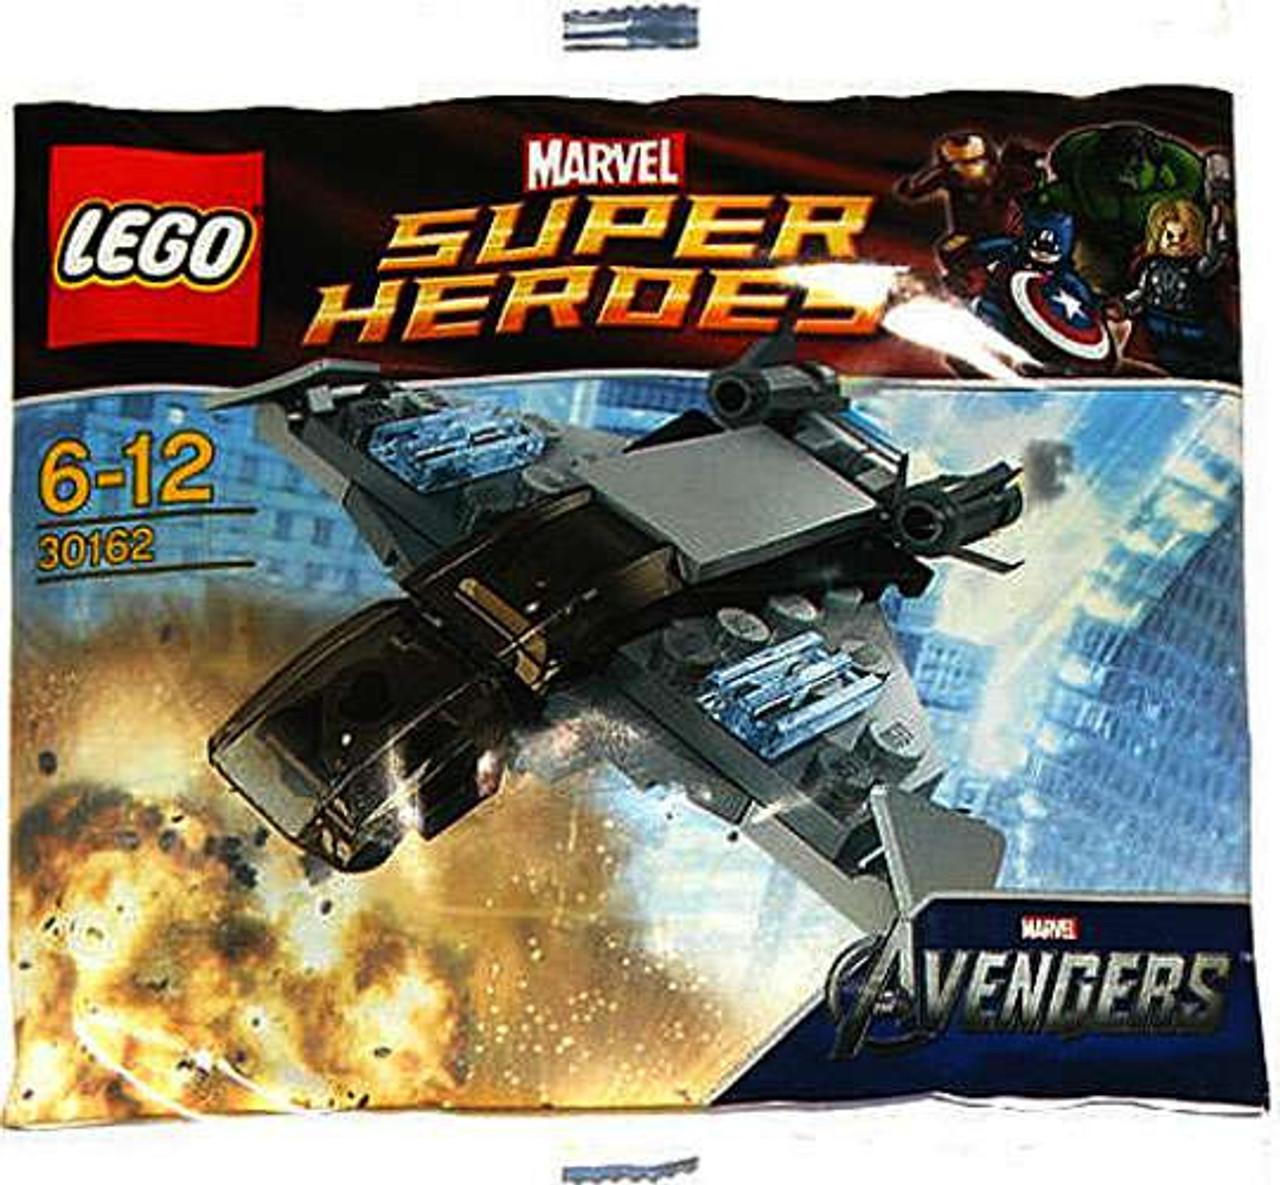 Bagged LEGO Super Heroes The Avengers Quinjet Set 30304